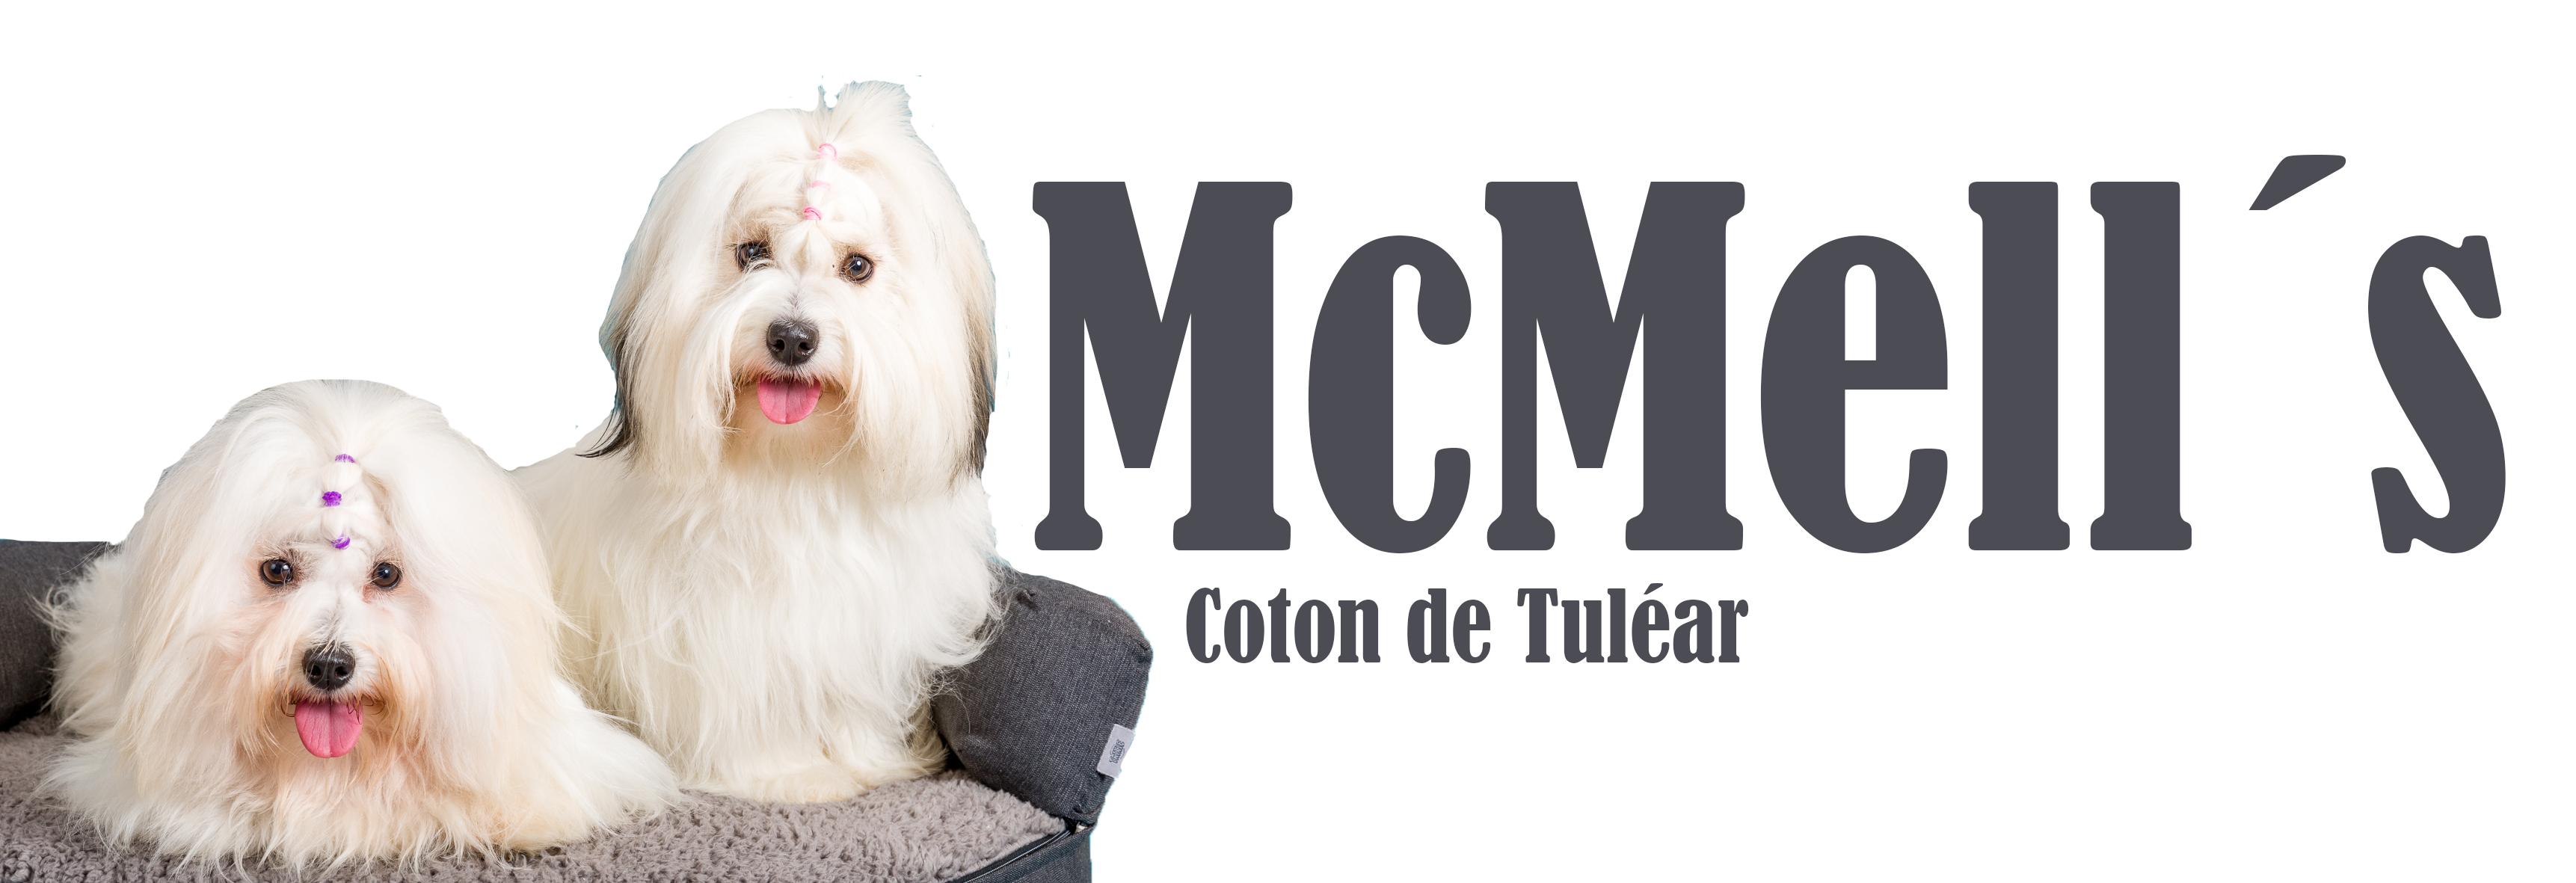 McMells Coton de Tulear